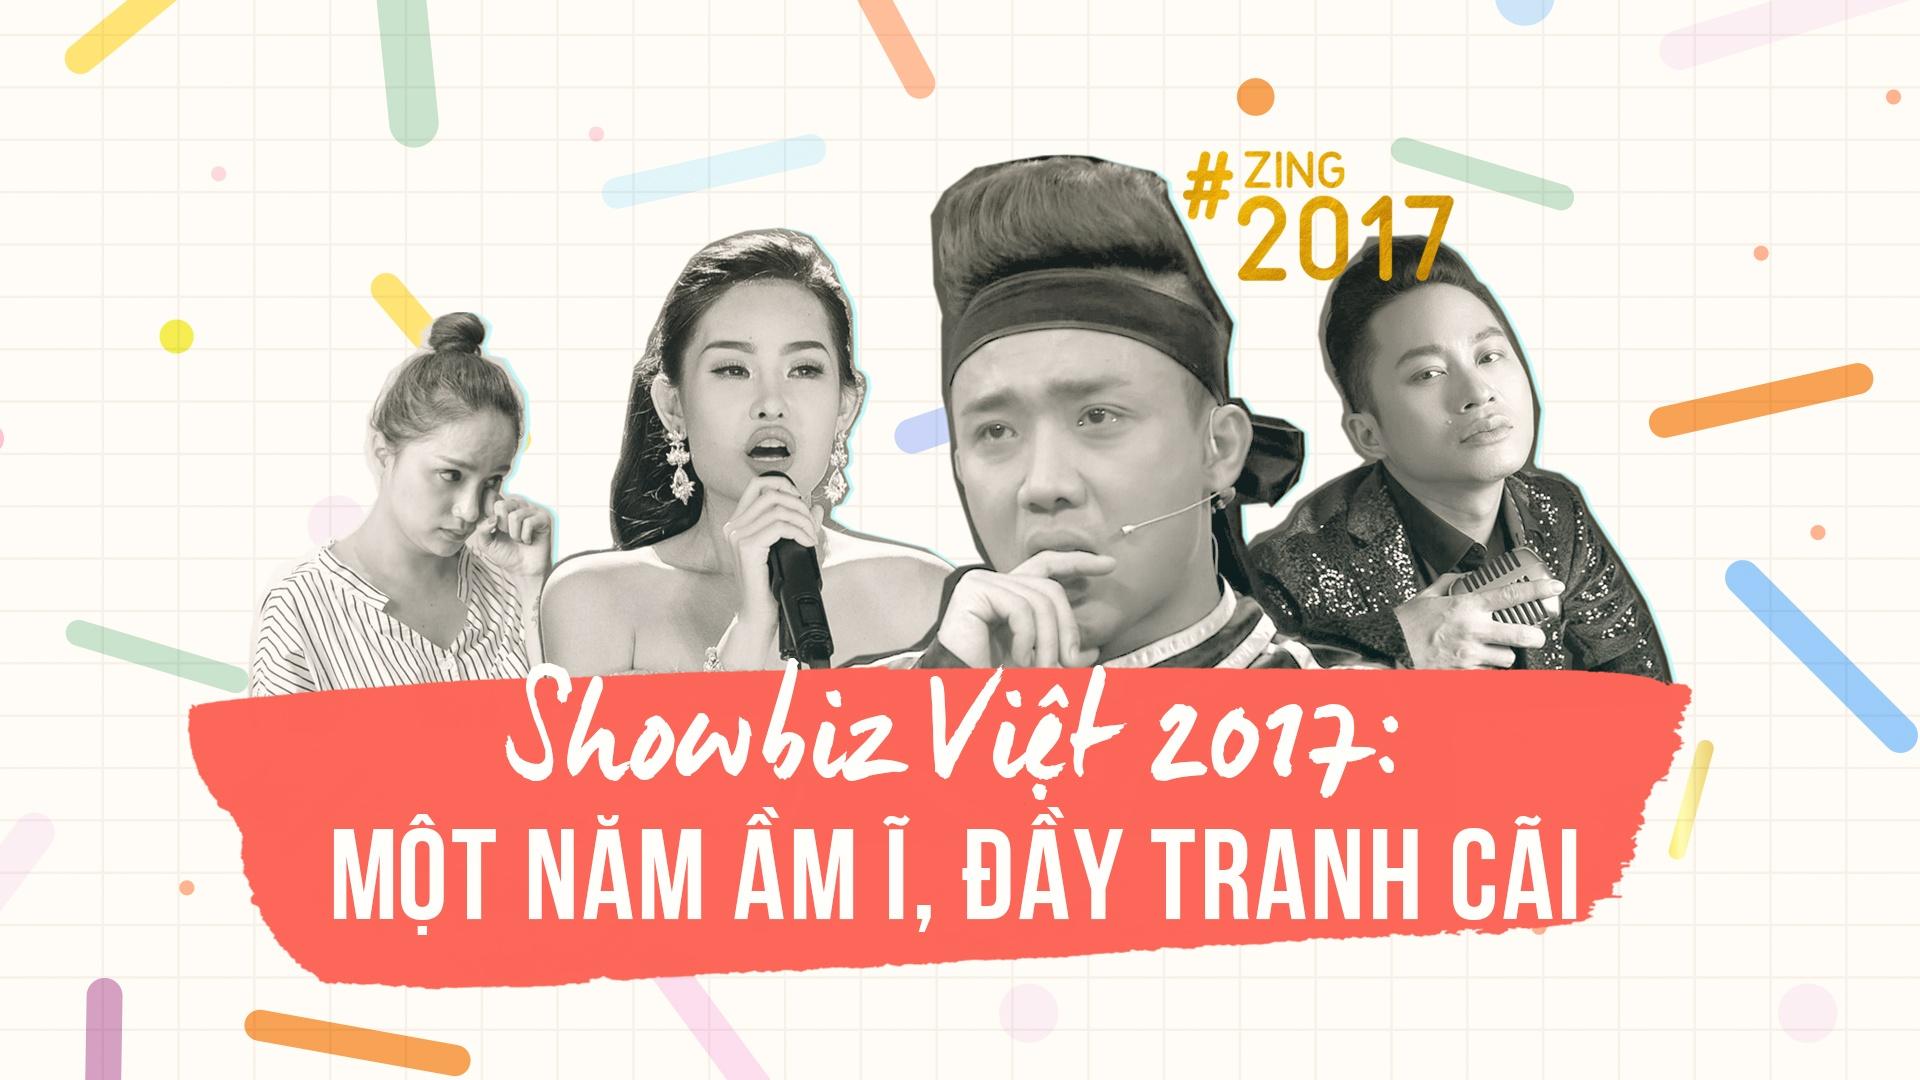 Showbiz Viet 2017: Am i va cai va hinh anh 1